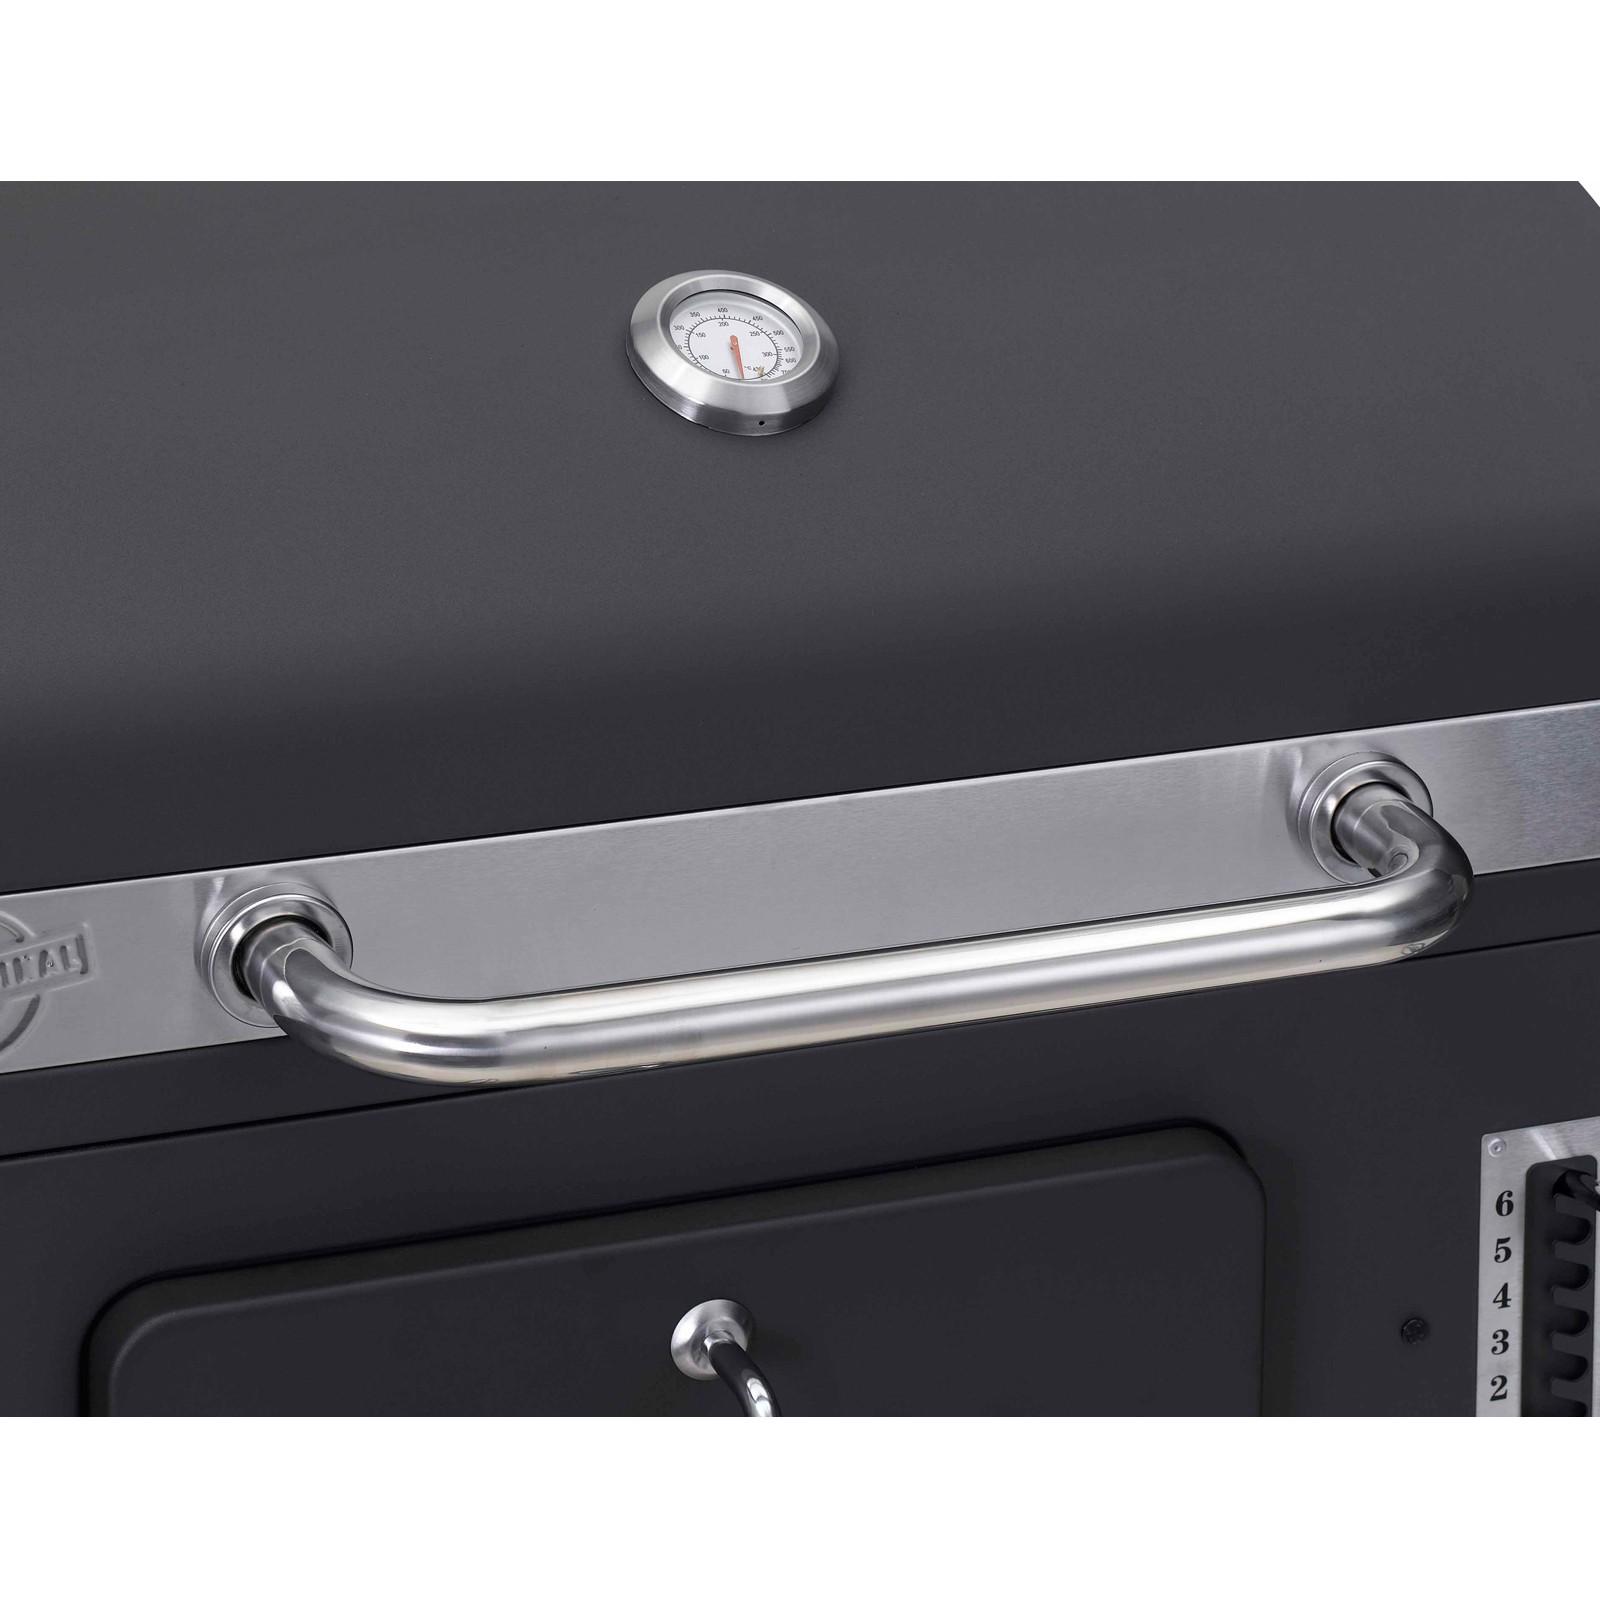 tepro holzkohlengrill grillwagen bbq grill kohlegrill toronto xxl 4011964010611 ebay. Black Bedroom Furniture Sets. Home Design Ideas